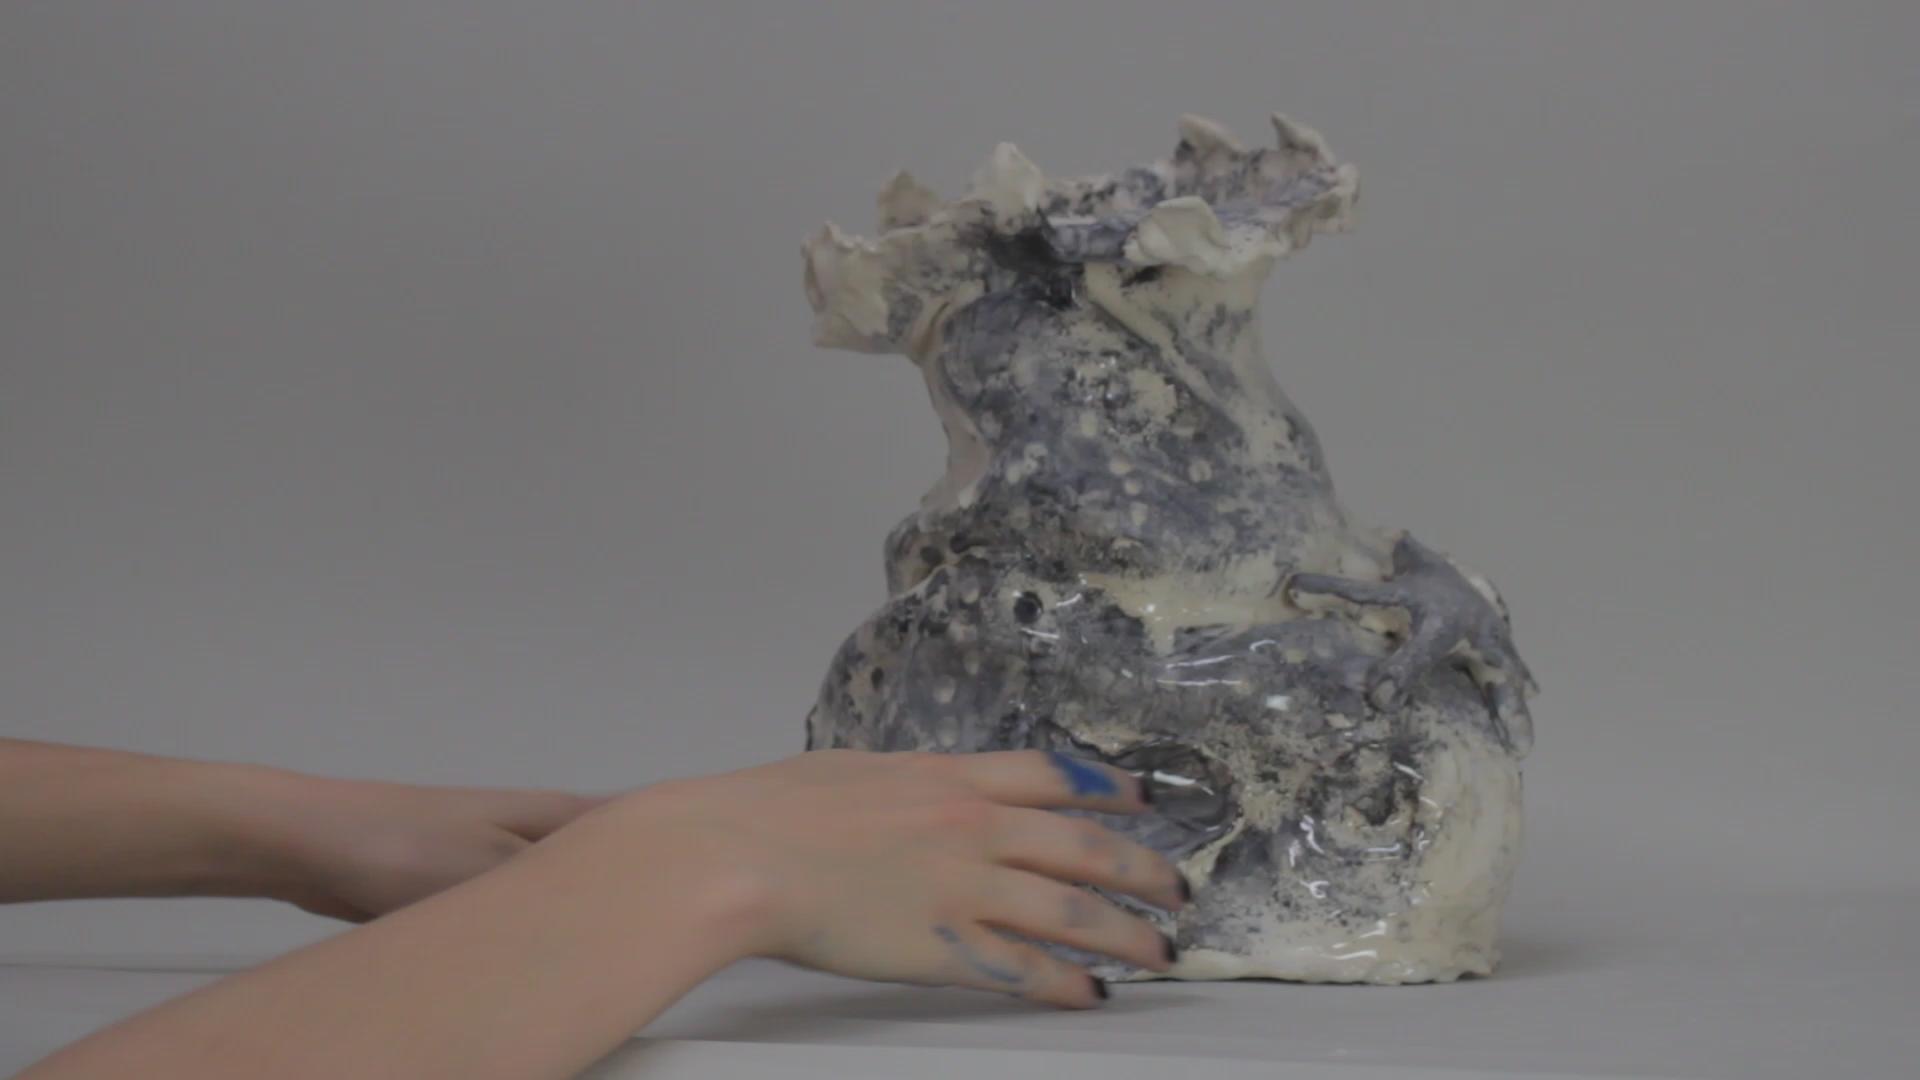 Pedestals of Clay, 2020